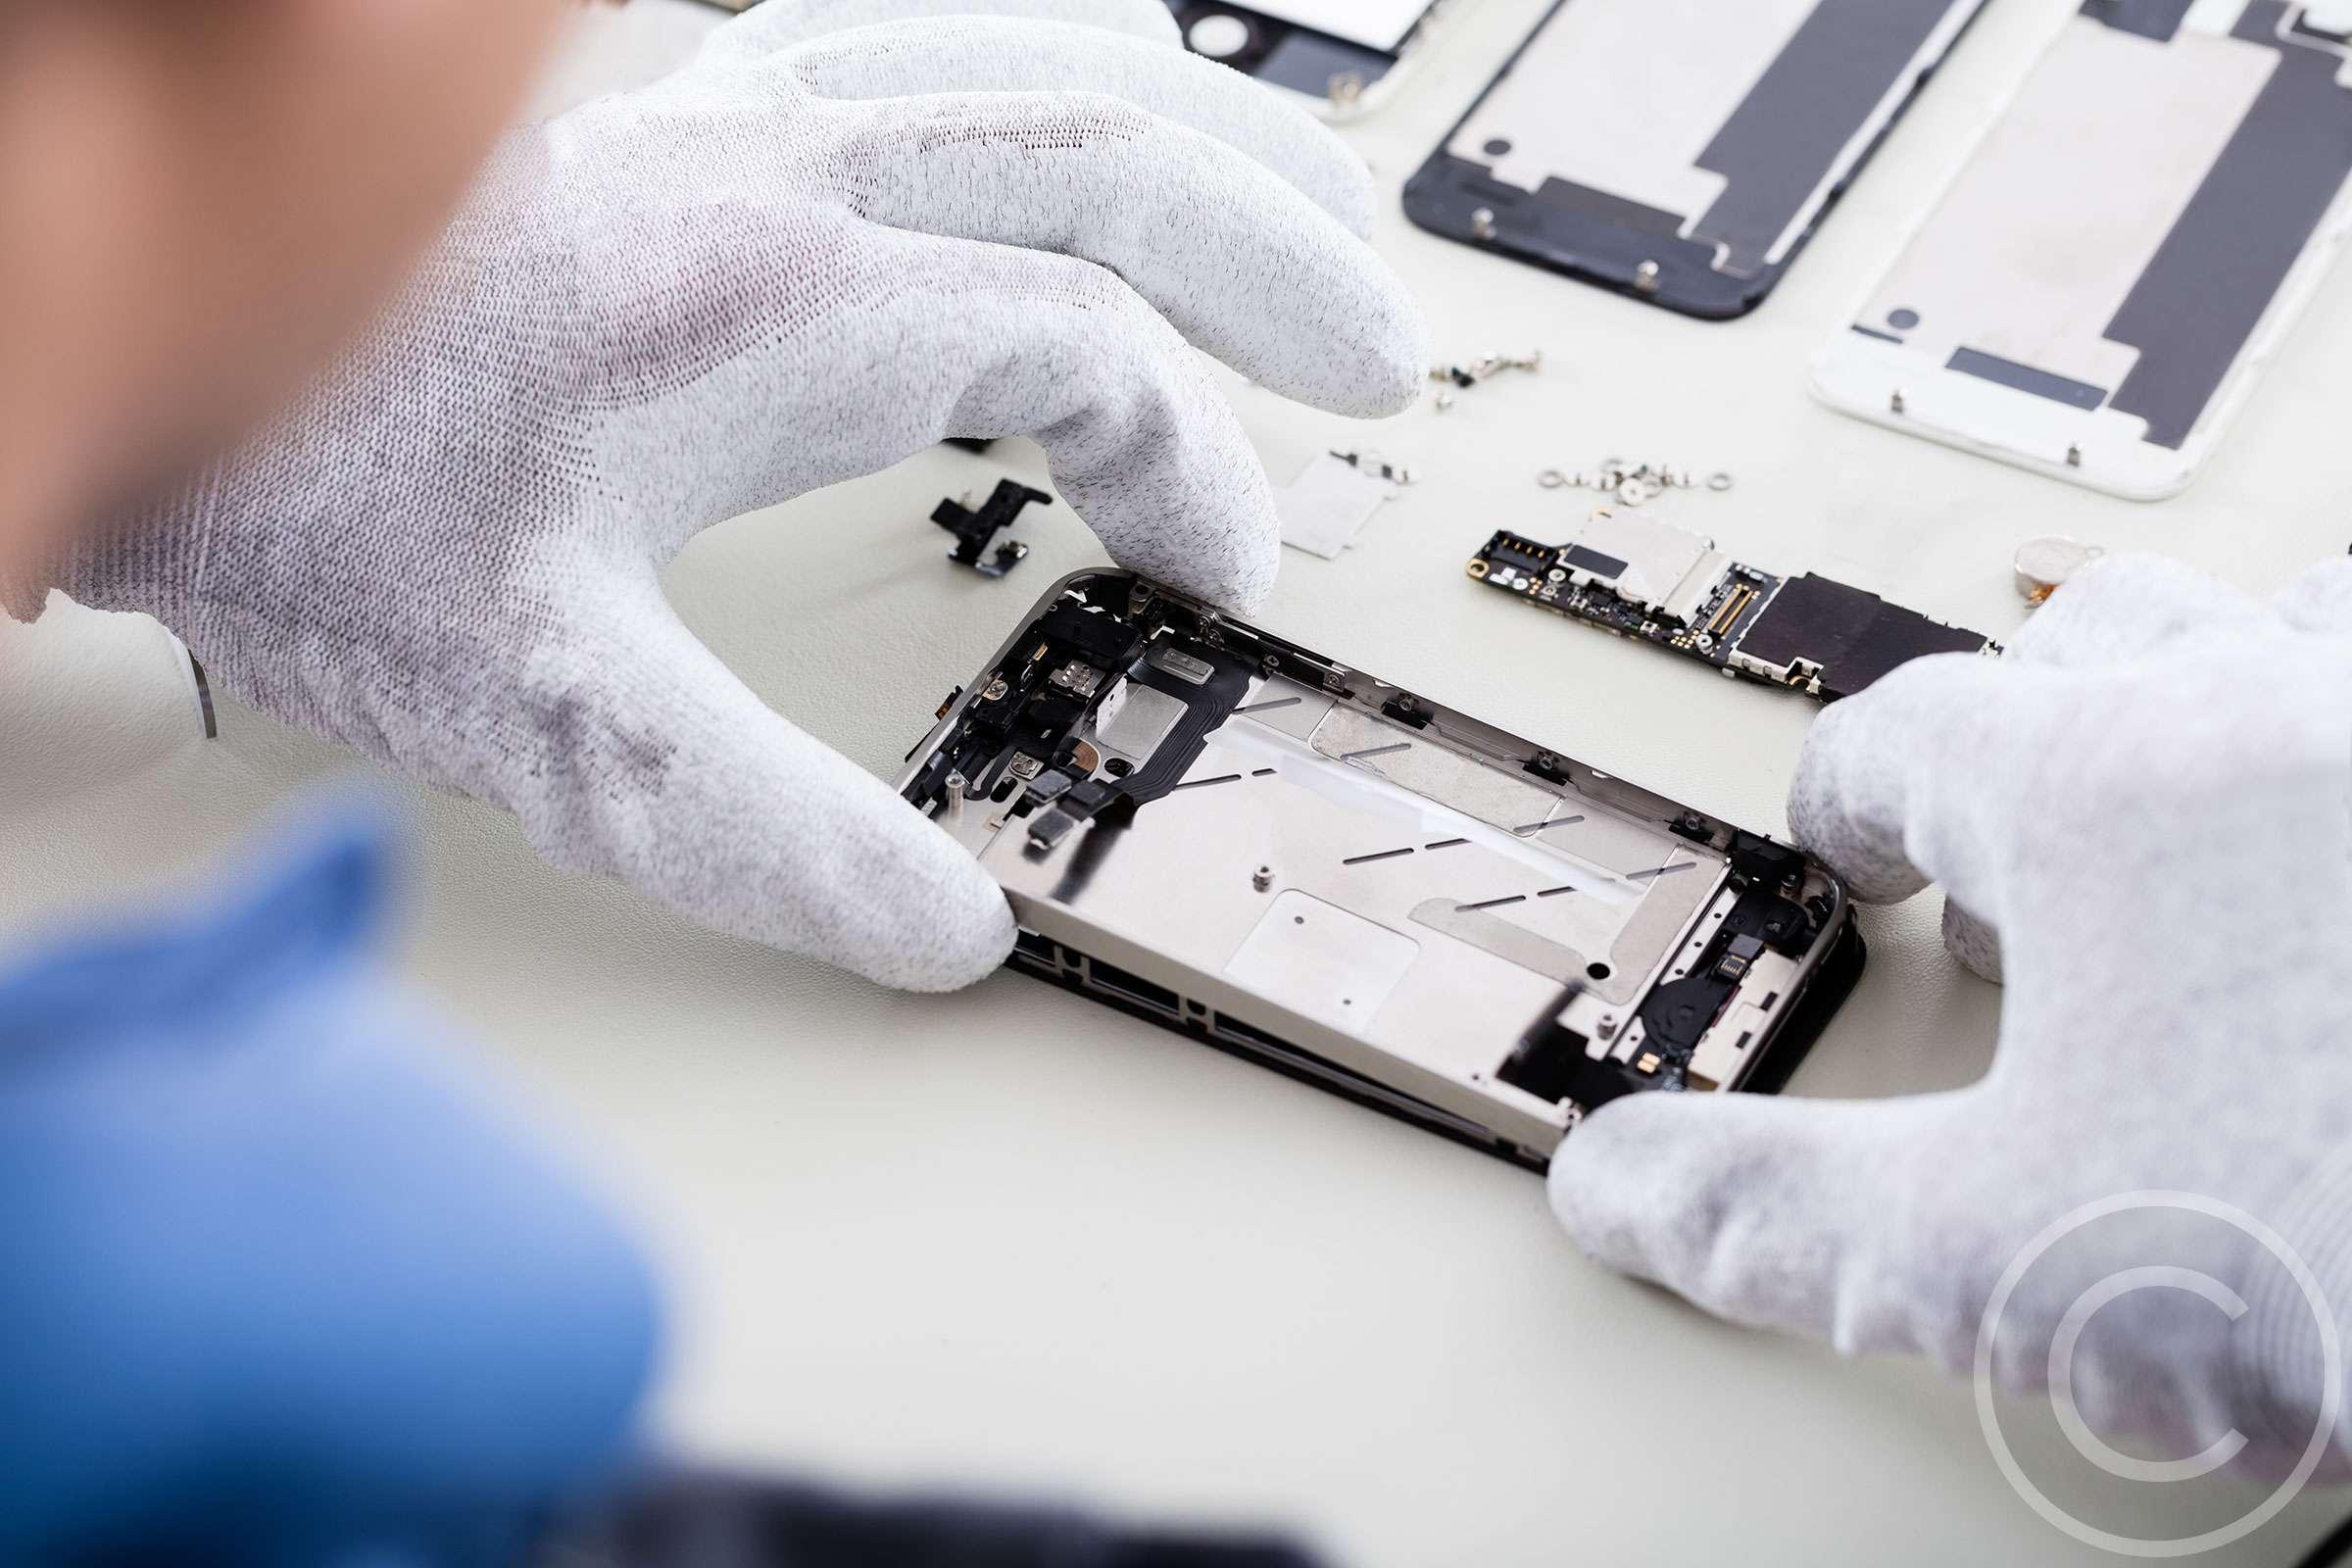 Как увеличить срок жизни батареи телефона, планшета или ноутбука